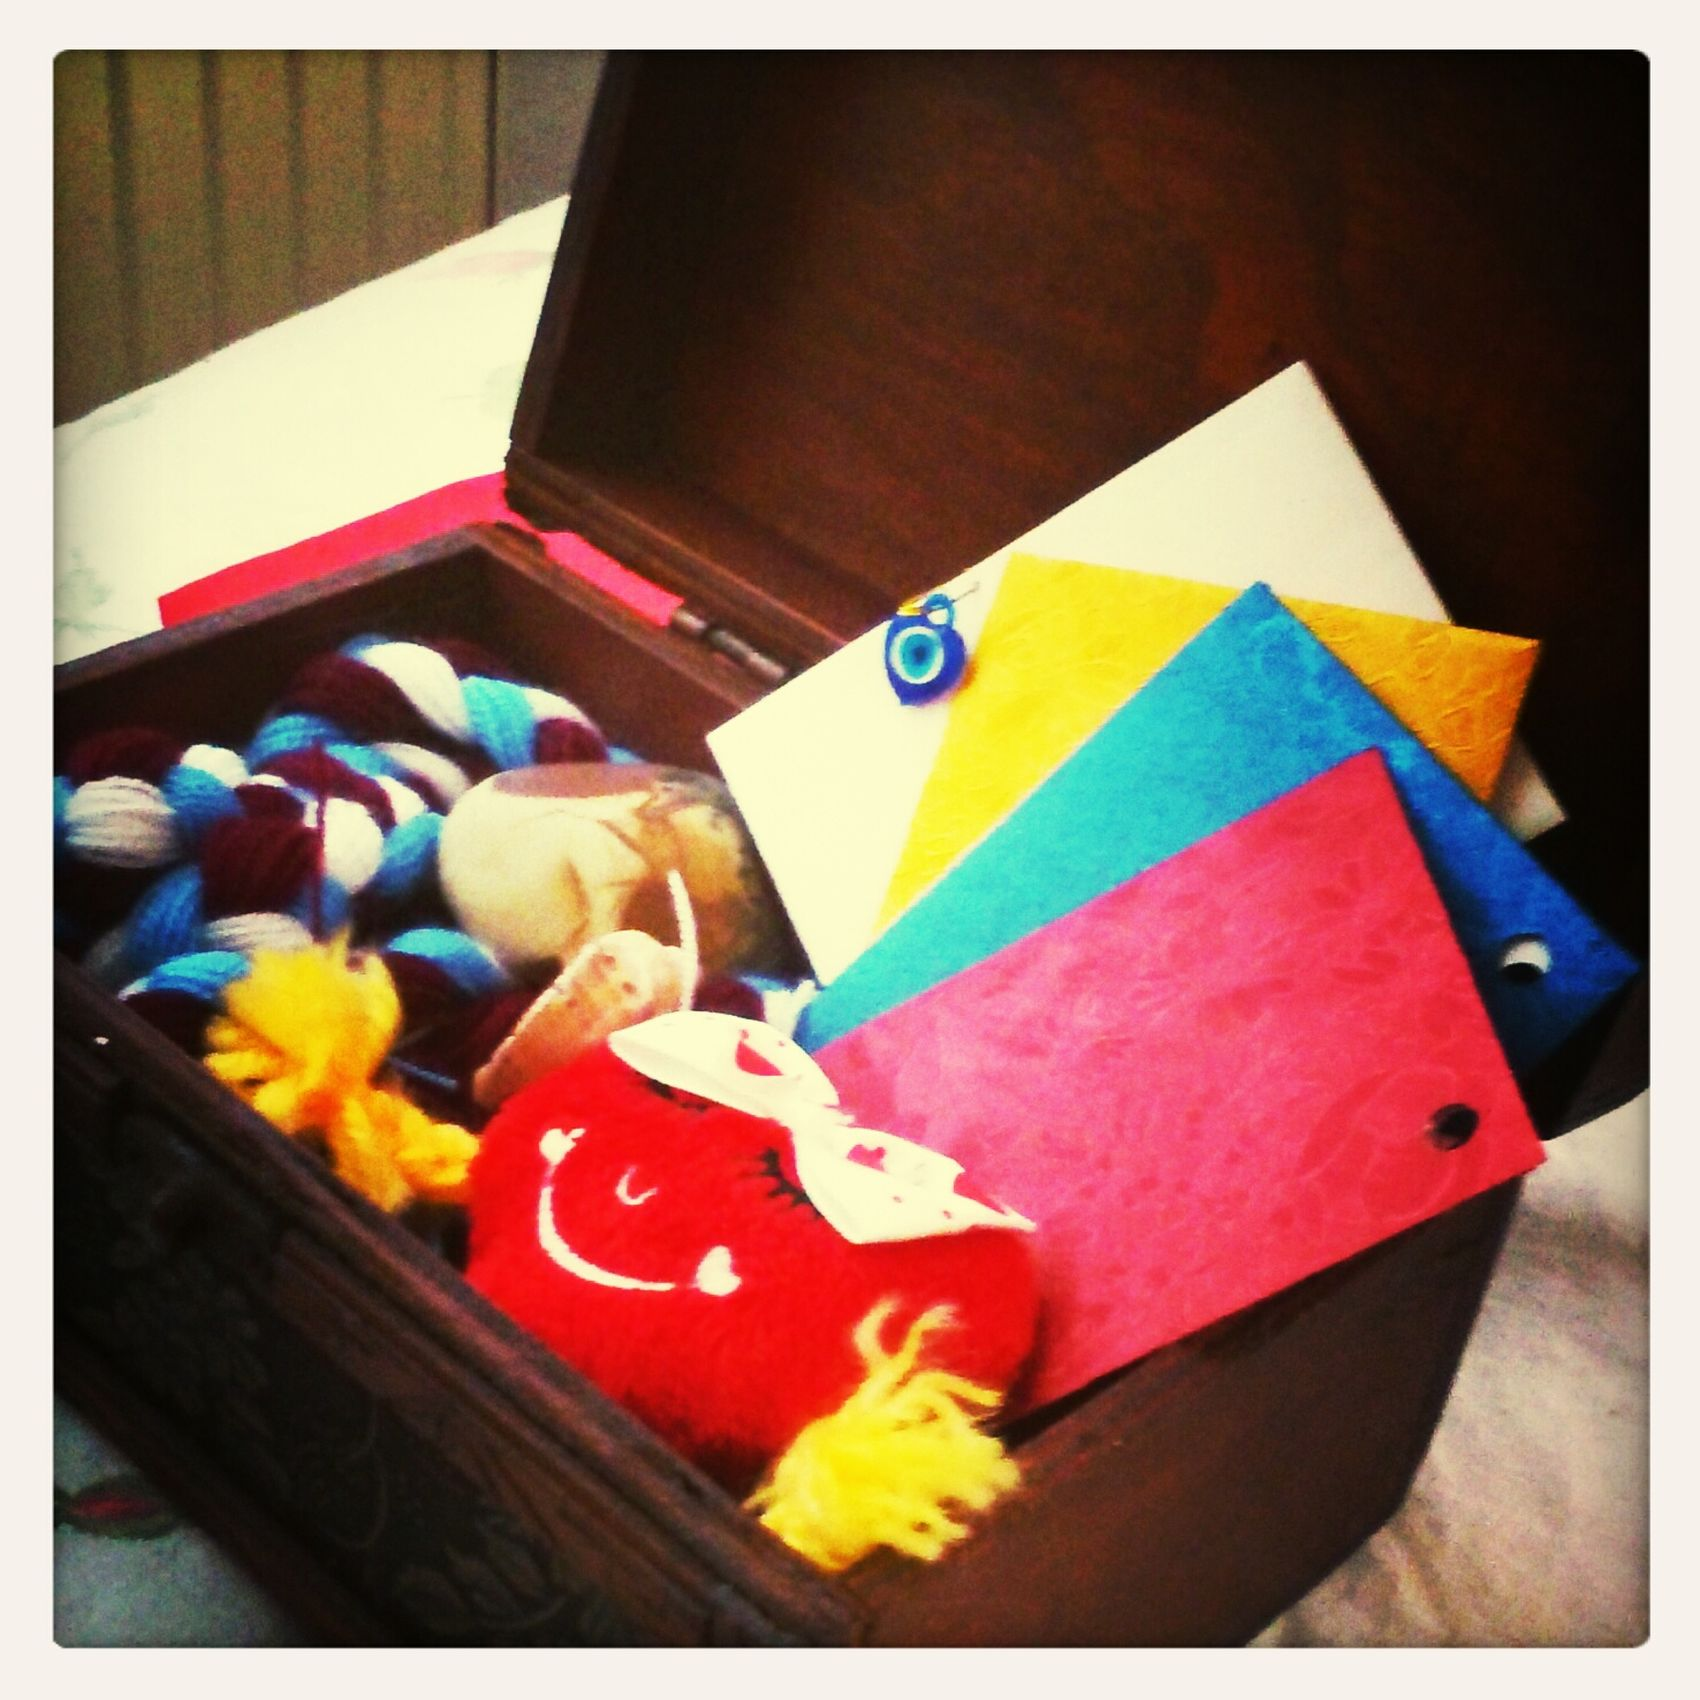 Enjoying Life My_souvenirs Box Taking Photos